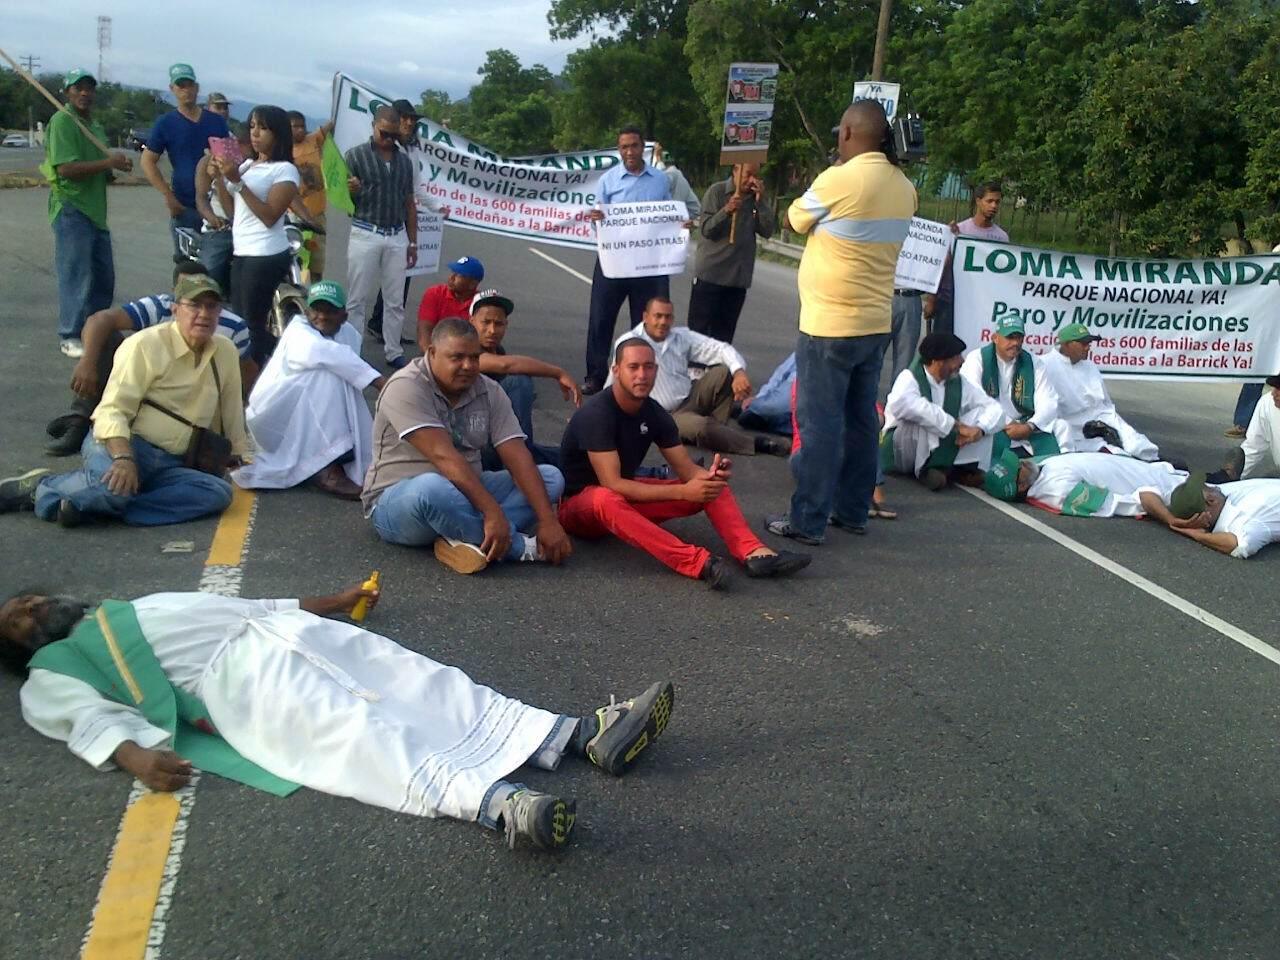 Decenas de manifestantes paralizaron autopista Duarte en favor Loma Miranda